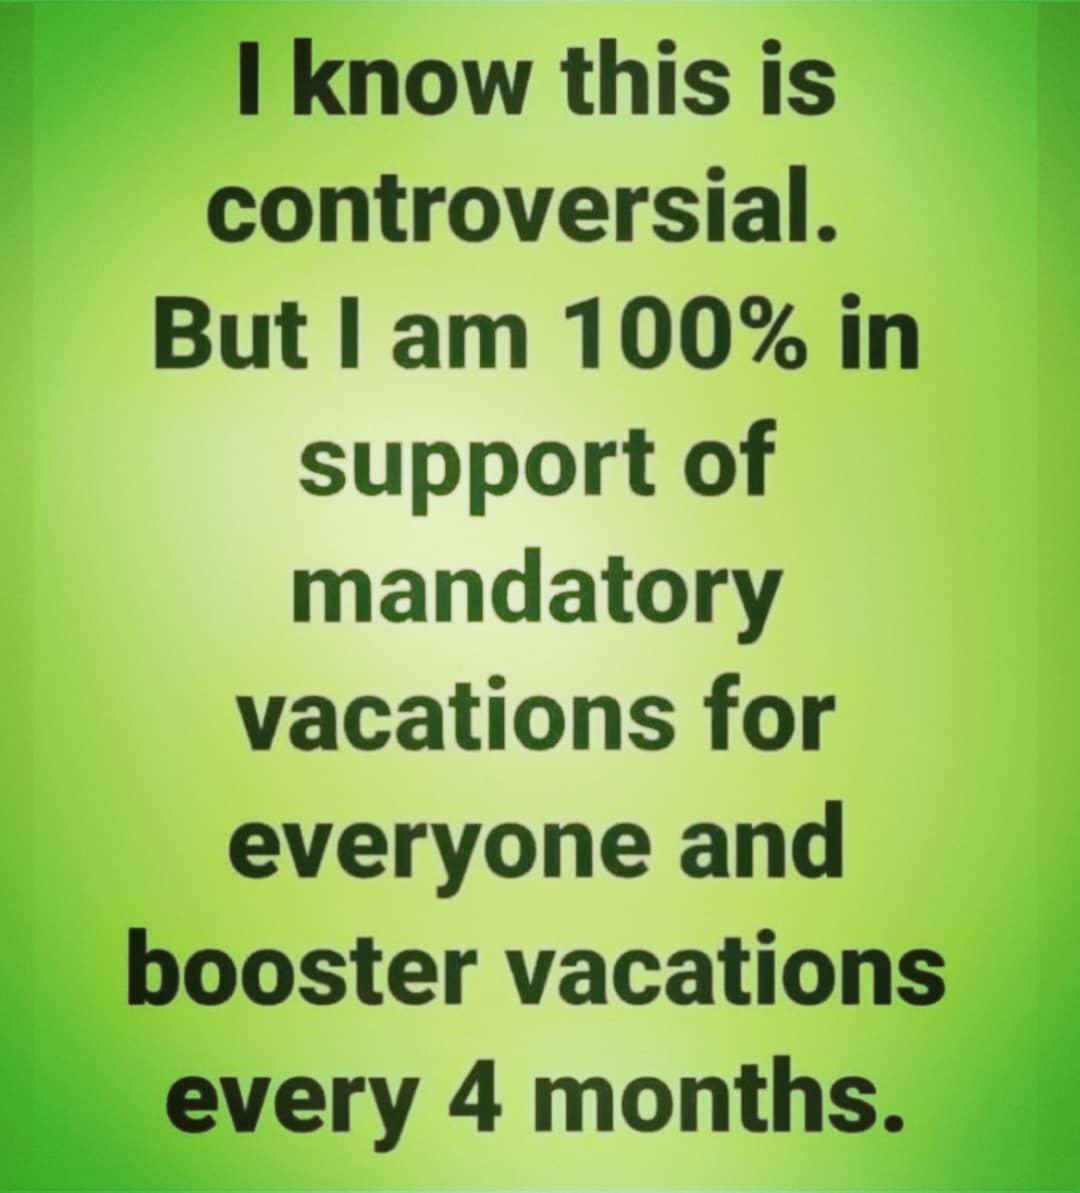 MANDATORY VACATIONS  enough is enough